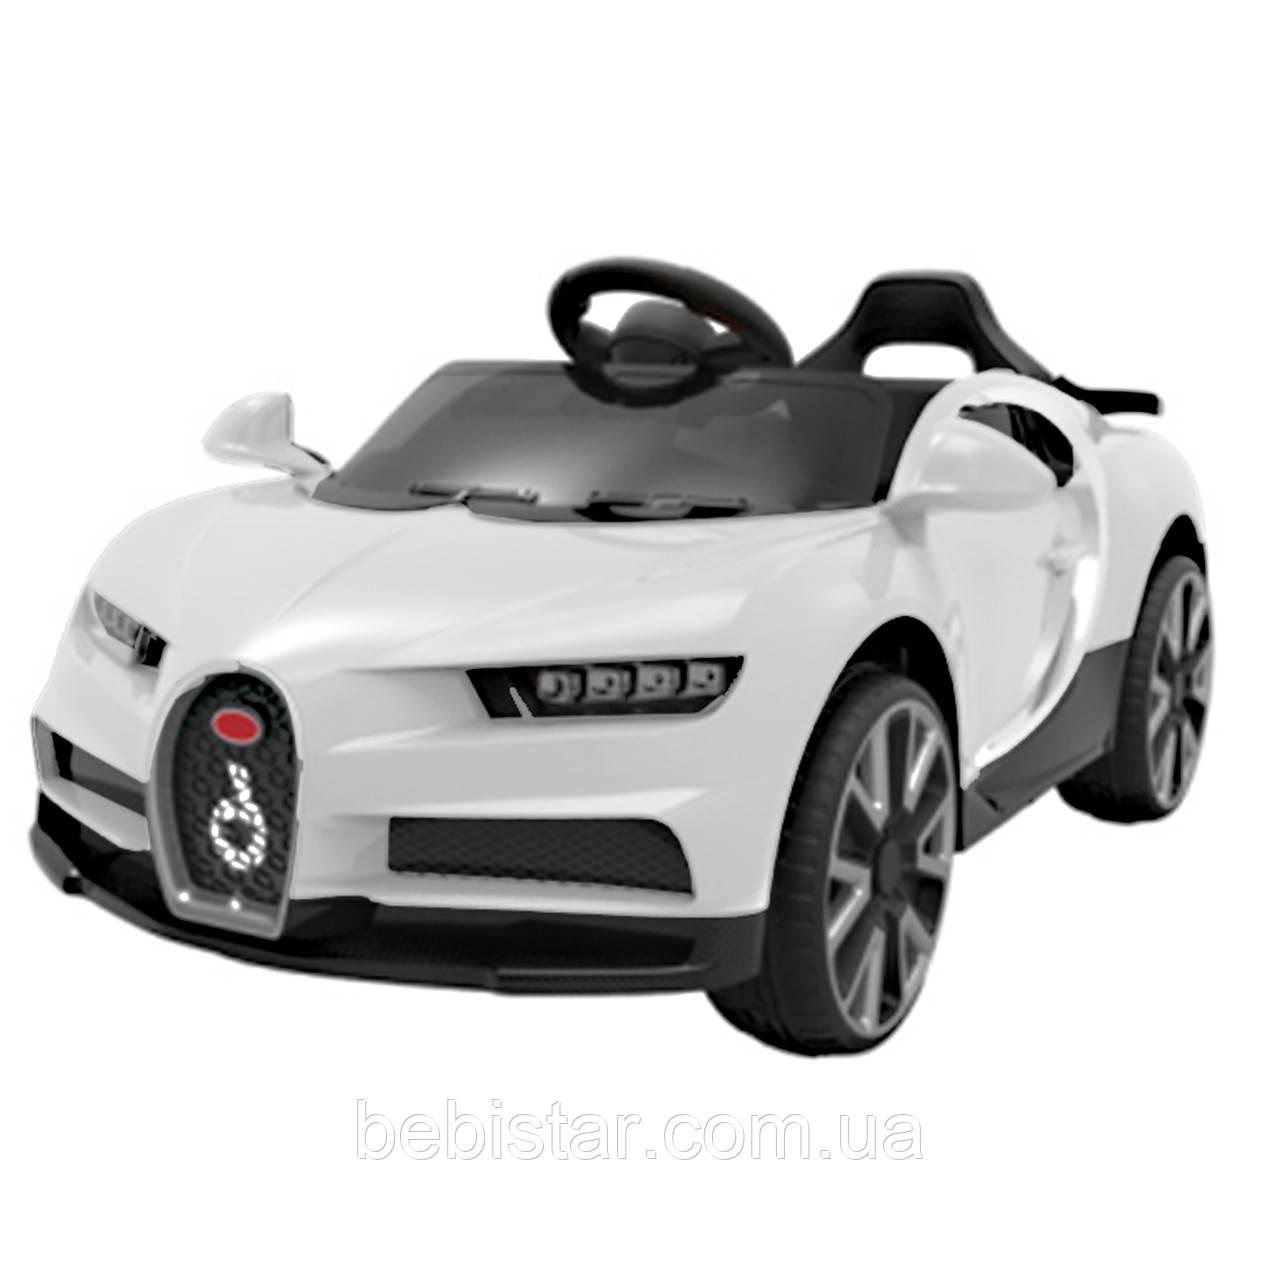 Электромобиль спорткар белый T-7638 EVA WHITE для деток 3-8 лет с пультом мотор 2*20W аккумулятор 12V4.5AH